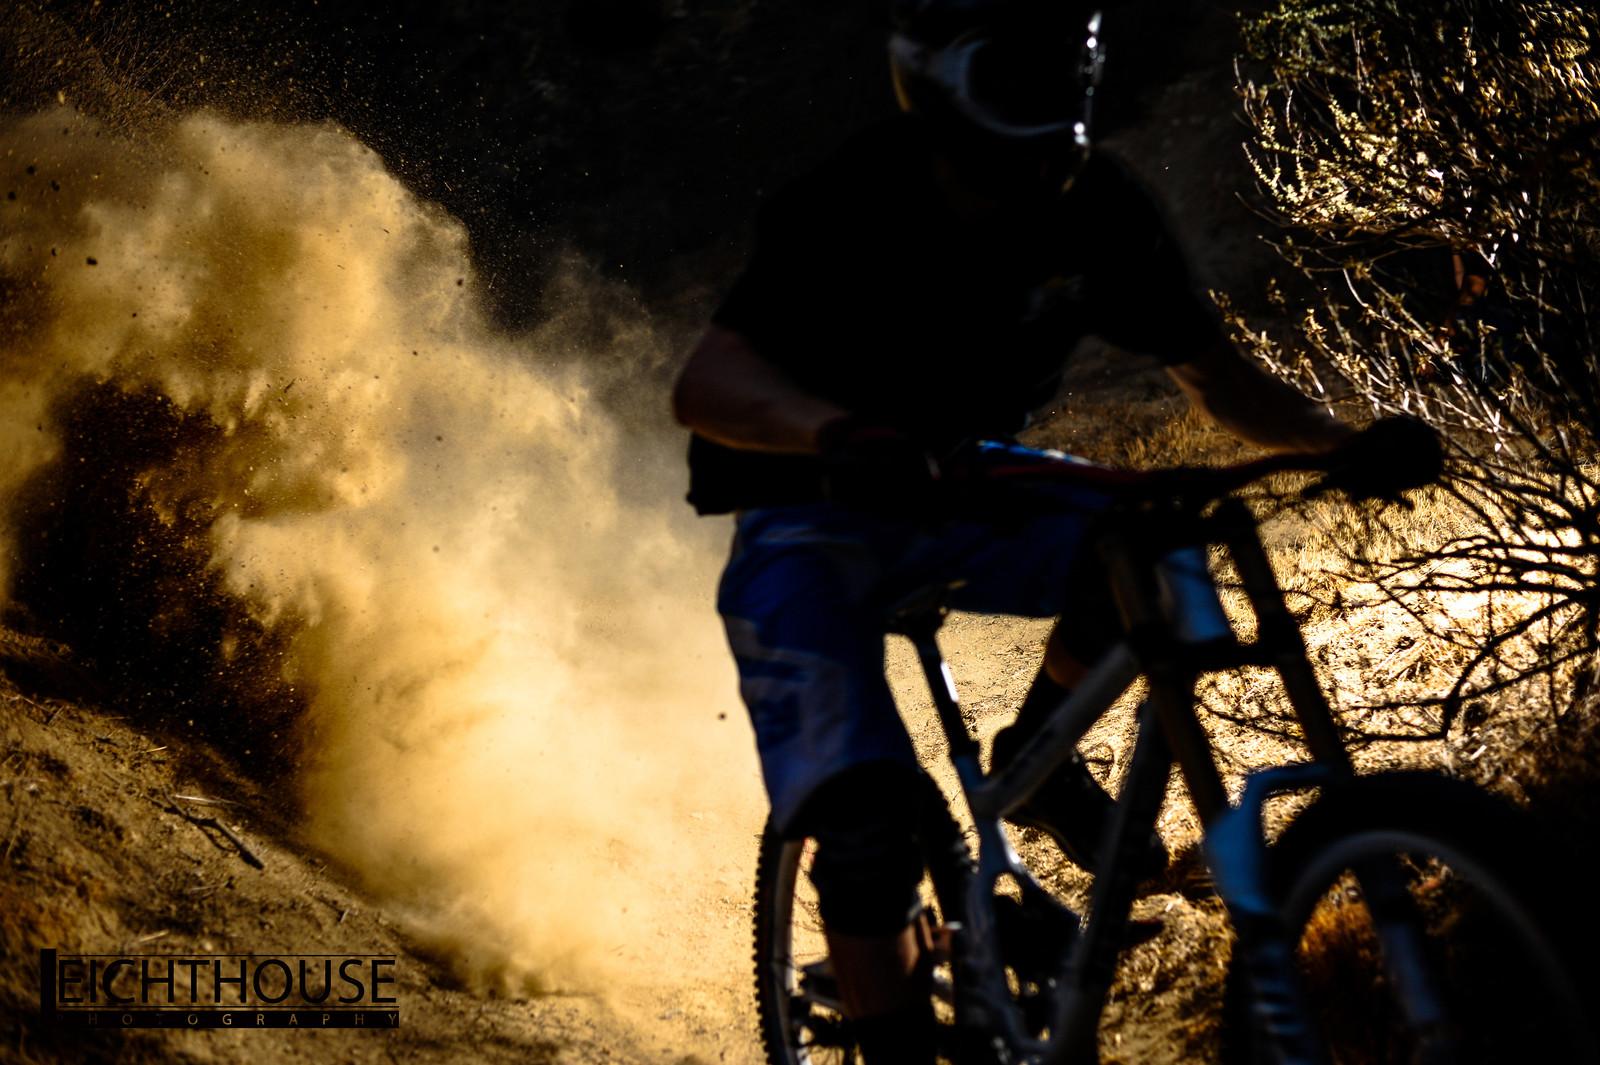 Mike Daniels berm explosion  - LeichtHouse photography - Mountain Biking Pictures - Vital MTB